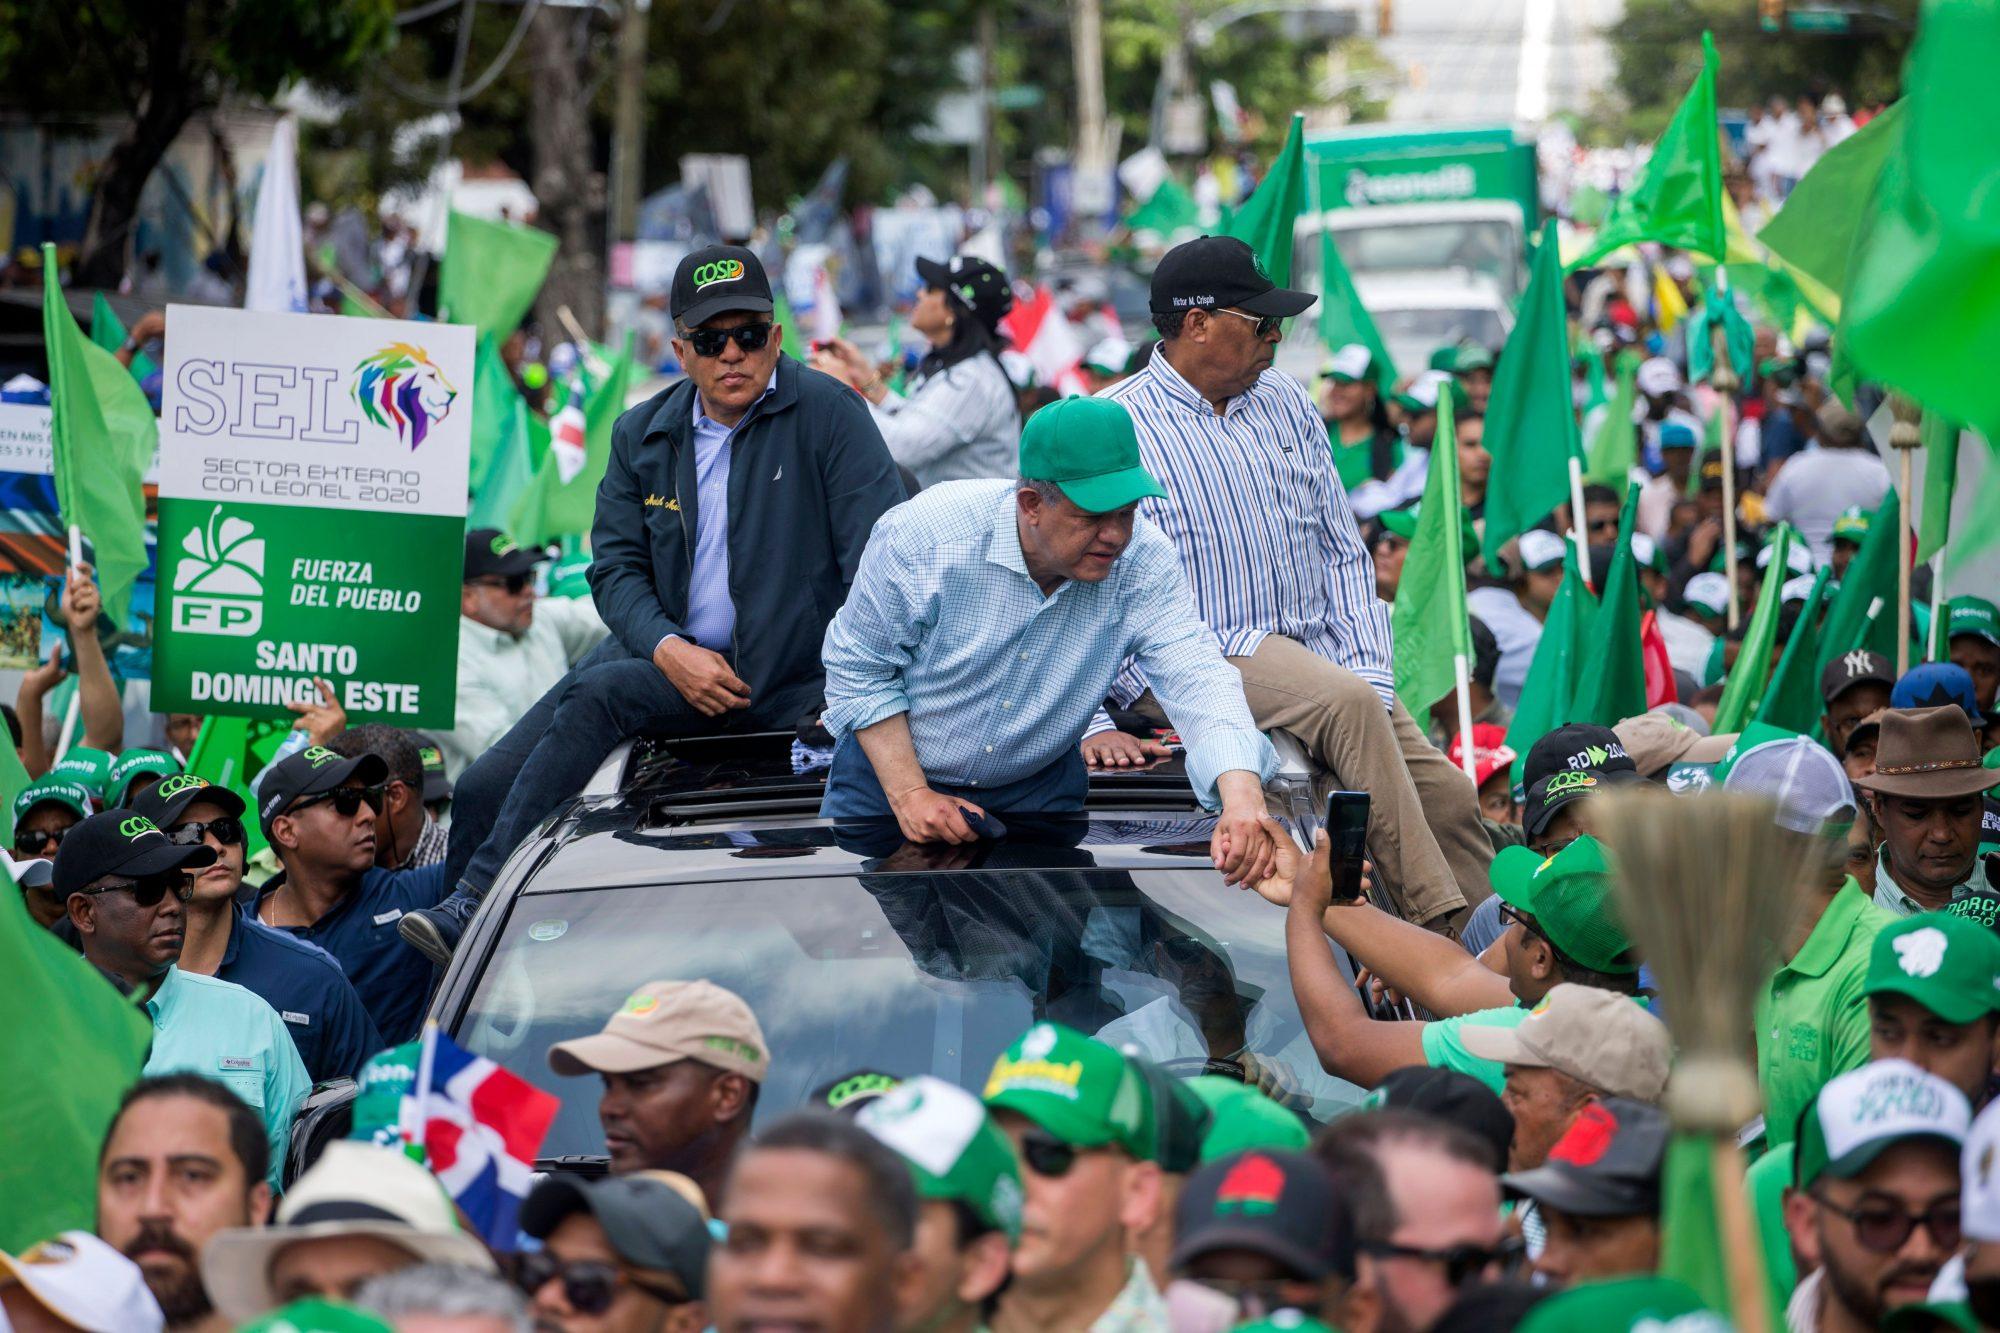 DOMINICAN REP-MUNICIPAL-ELECTION-SUSPENSION-PROTEST-FERNANDEZ